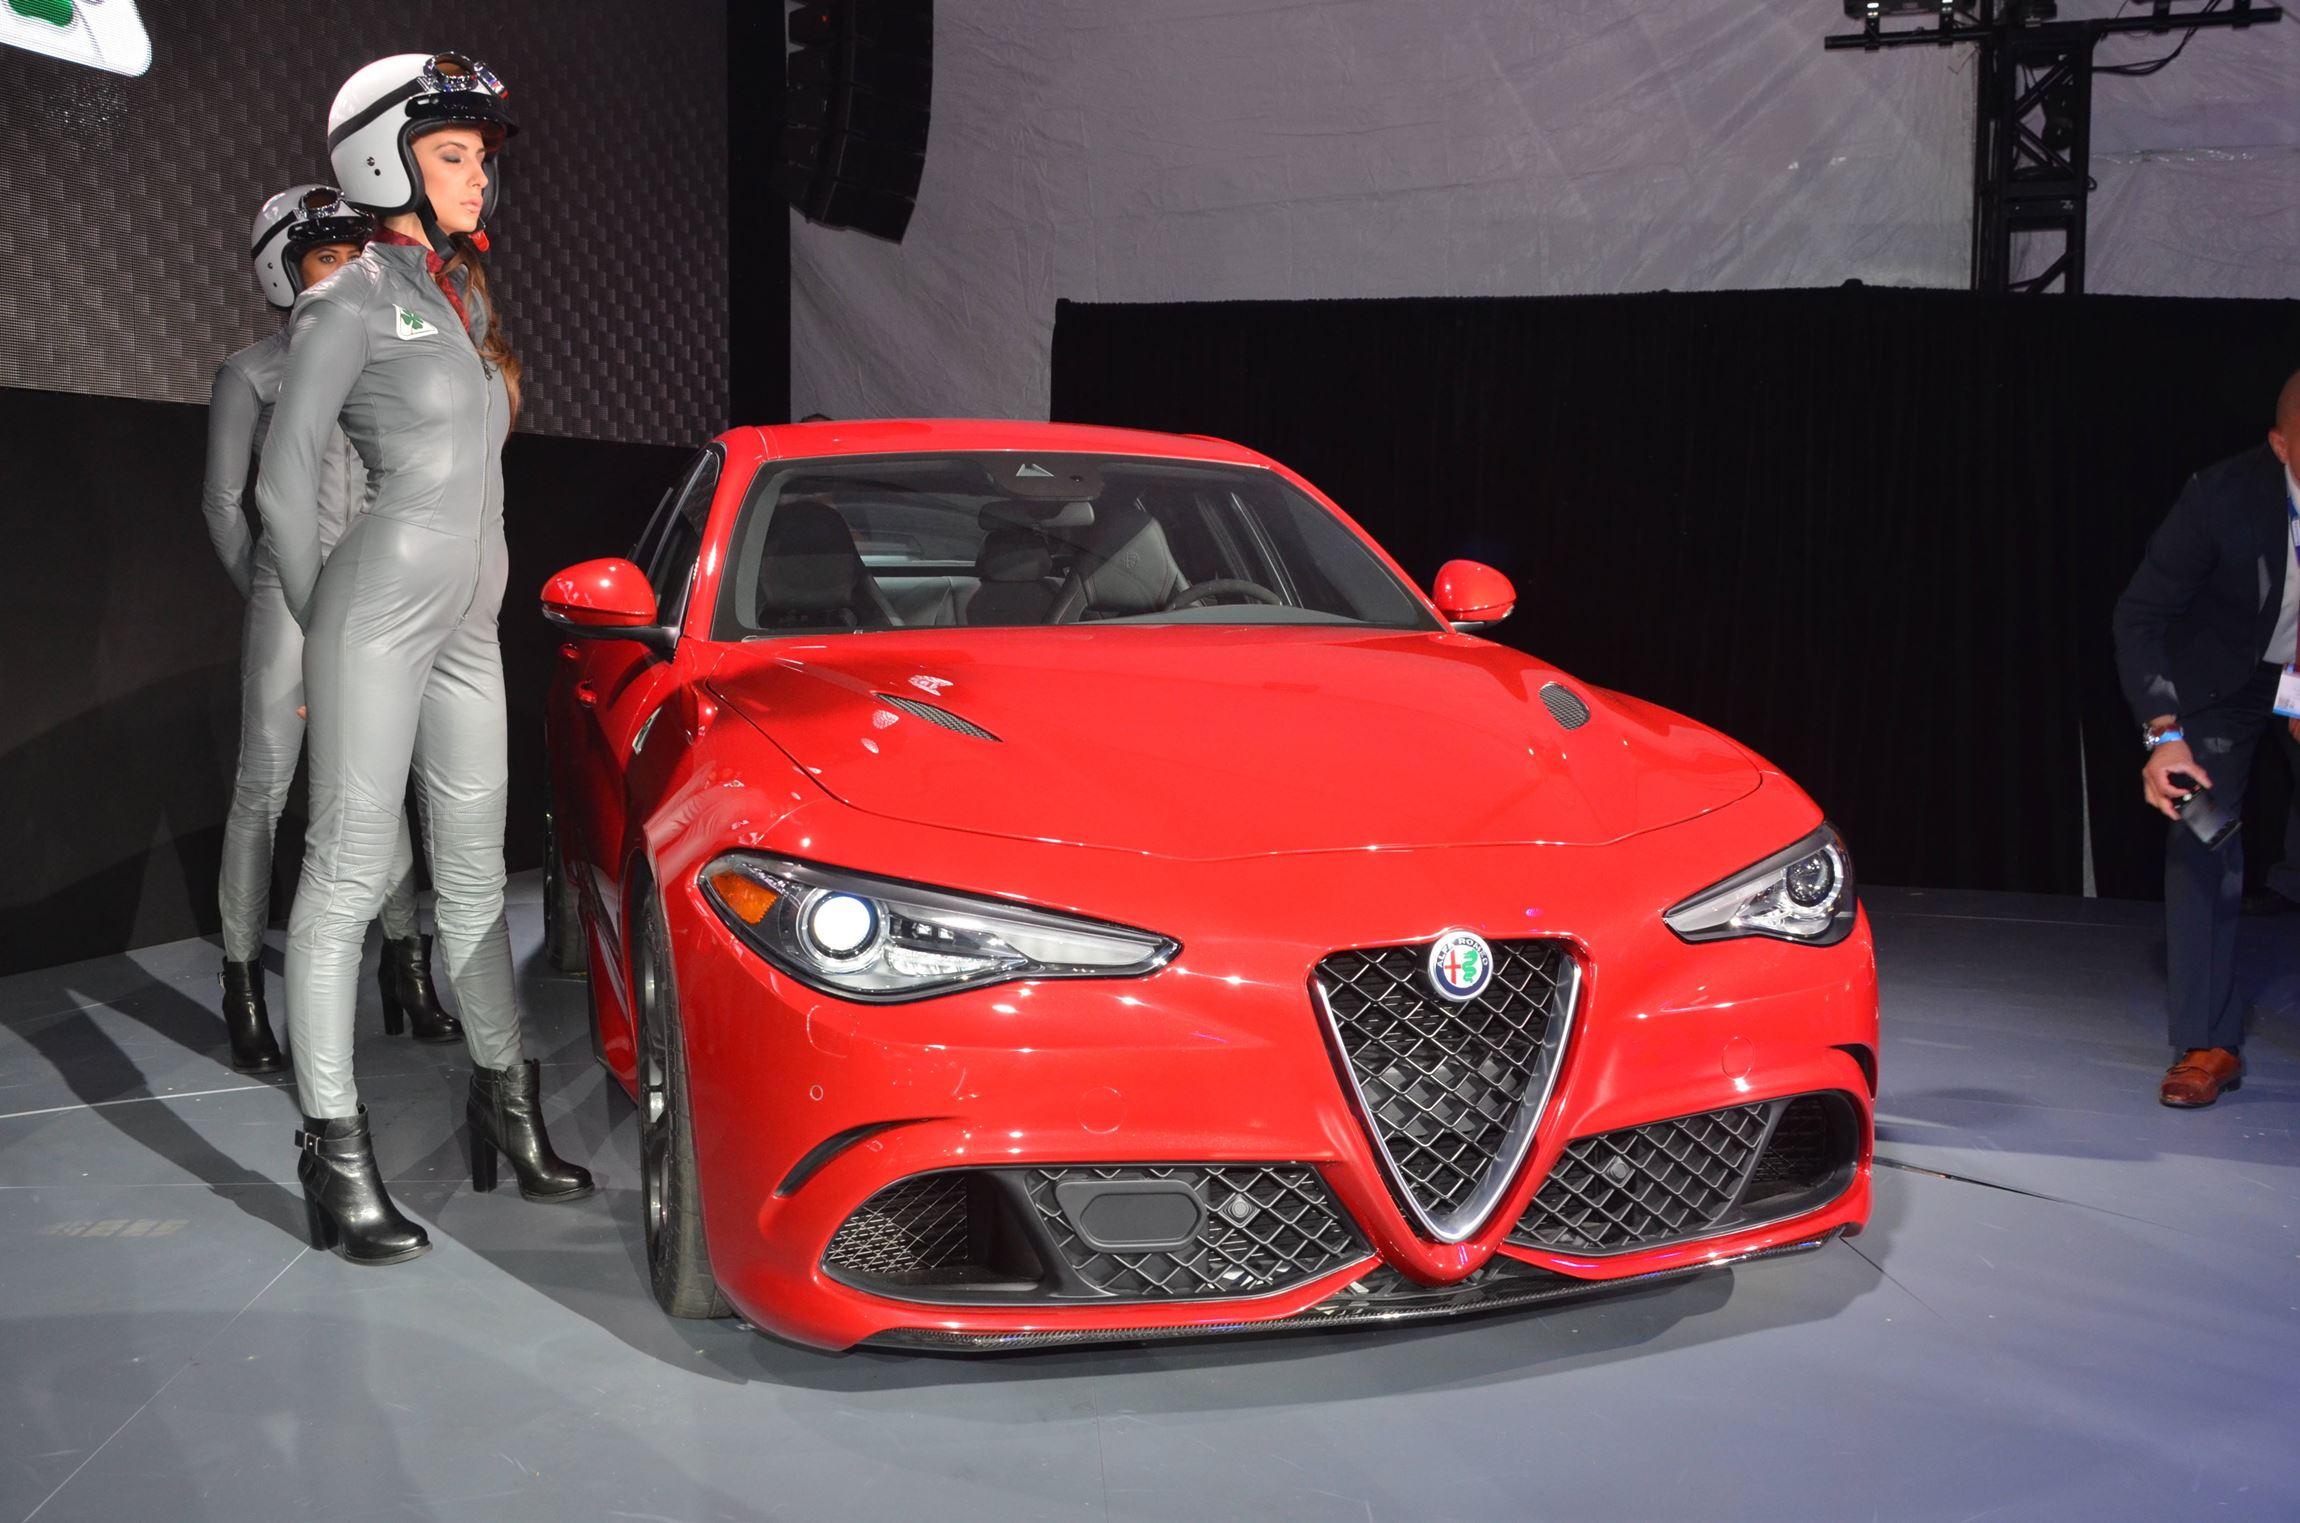 Alfa Giulia] Impressies en scoops